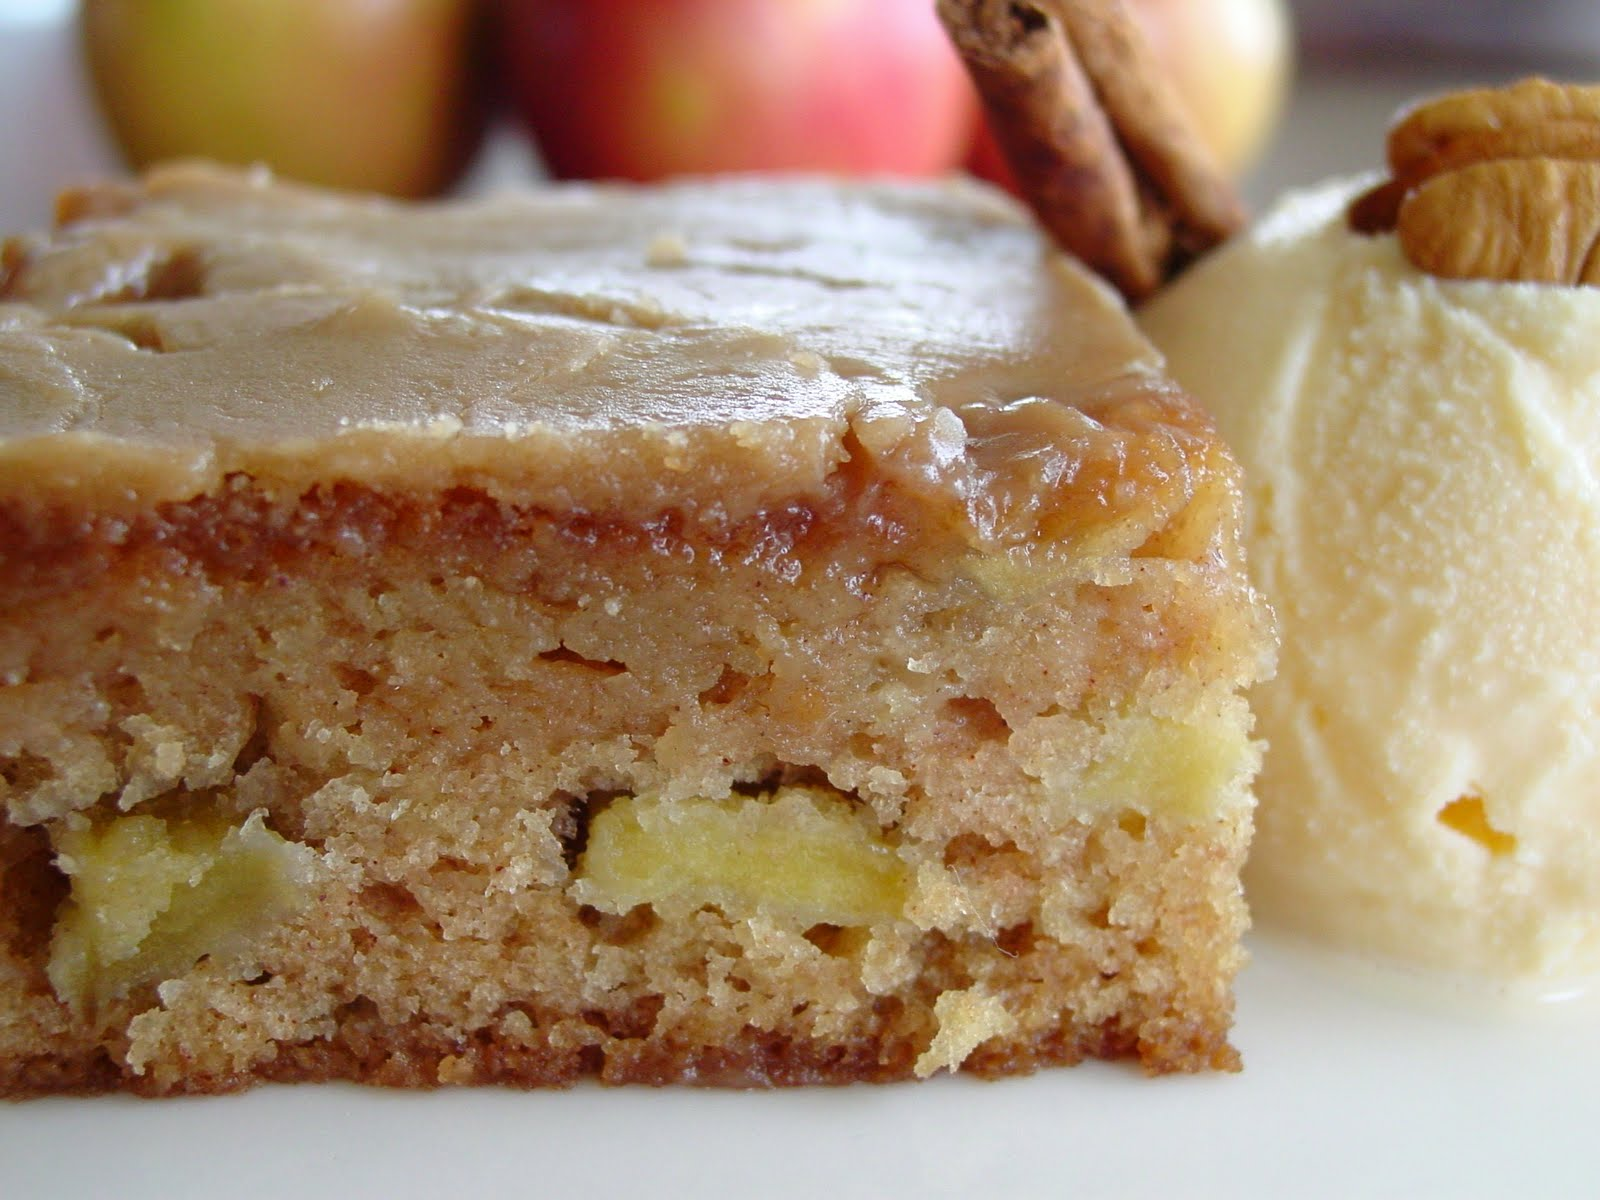 Apple Cake Recipe With Brown Sugar Glaze